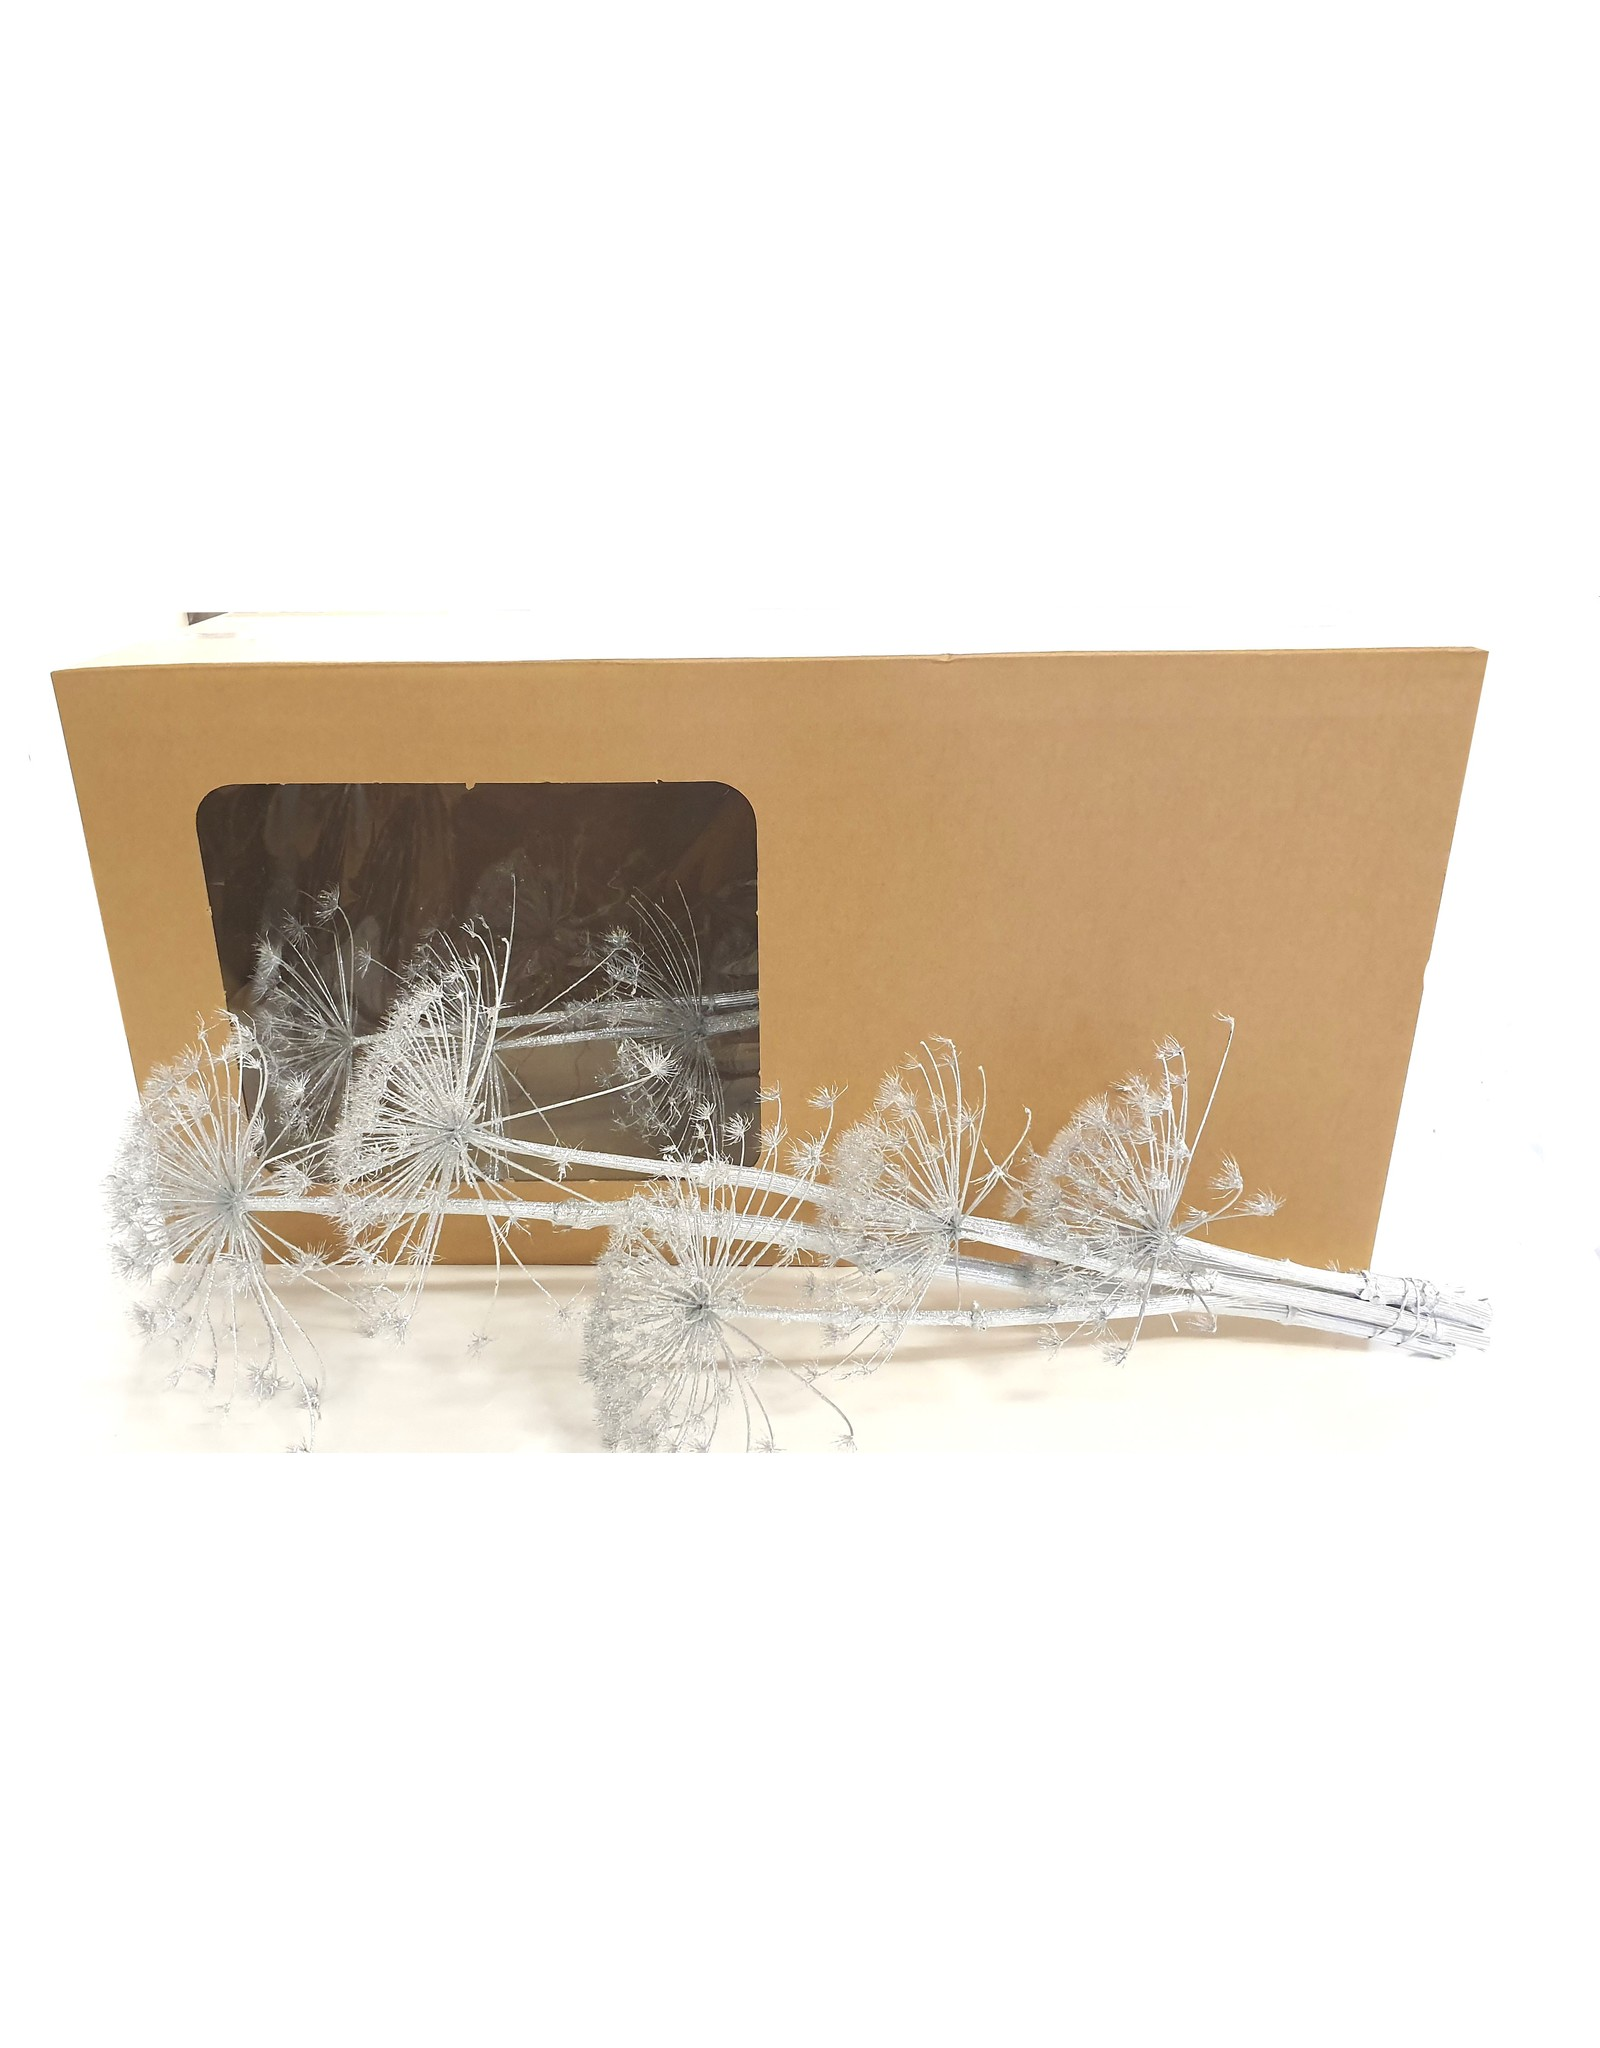 Heracleum heads 60-110cm 10pc in Vensterbox Silver + Glitter x 1